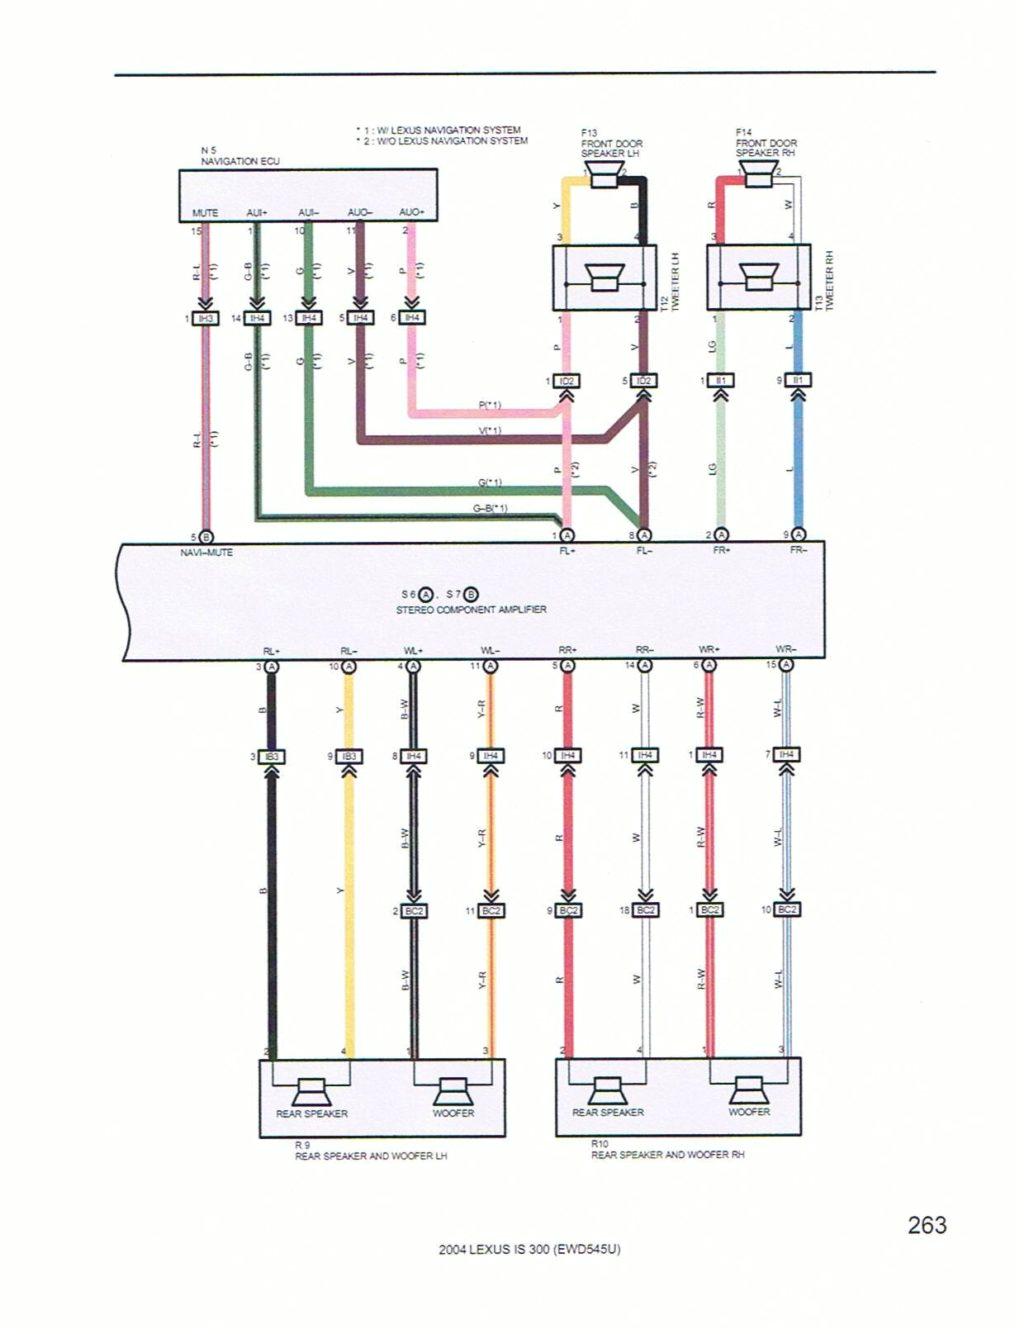 2004 jetta wiring diagram wiring diagram expert 2004 jetta gli wiring diagram 2001 jetta wiring diagram